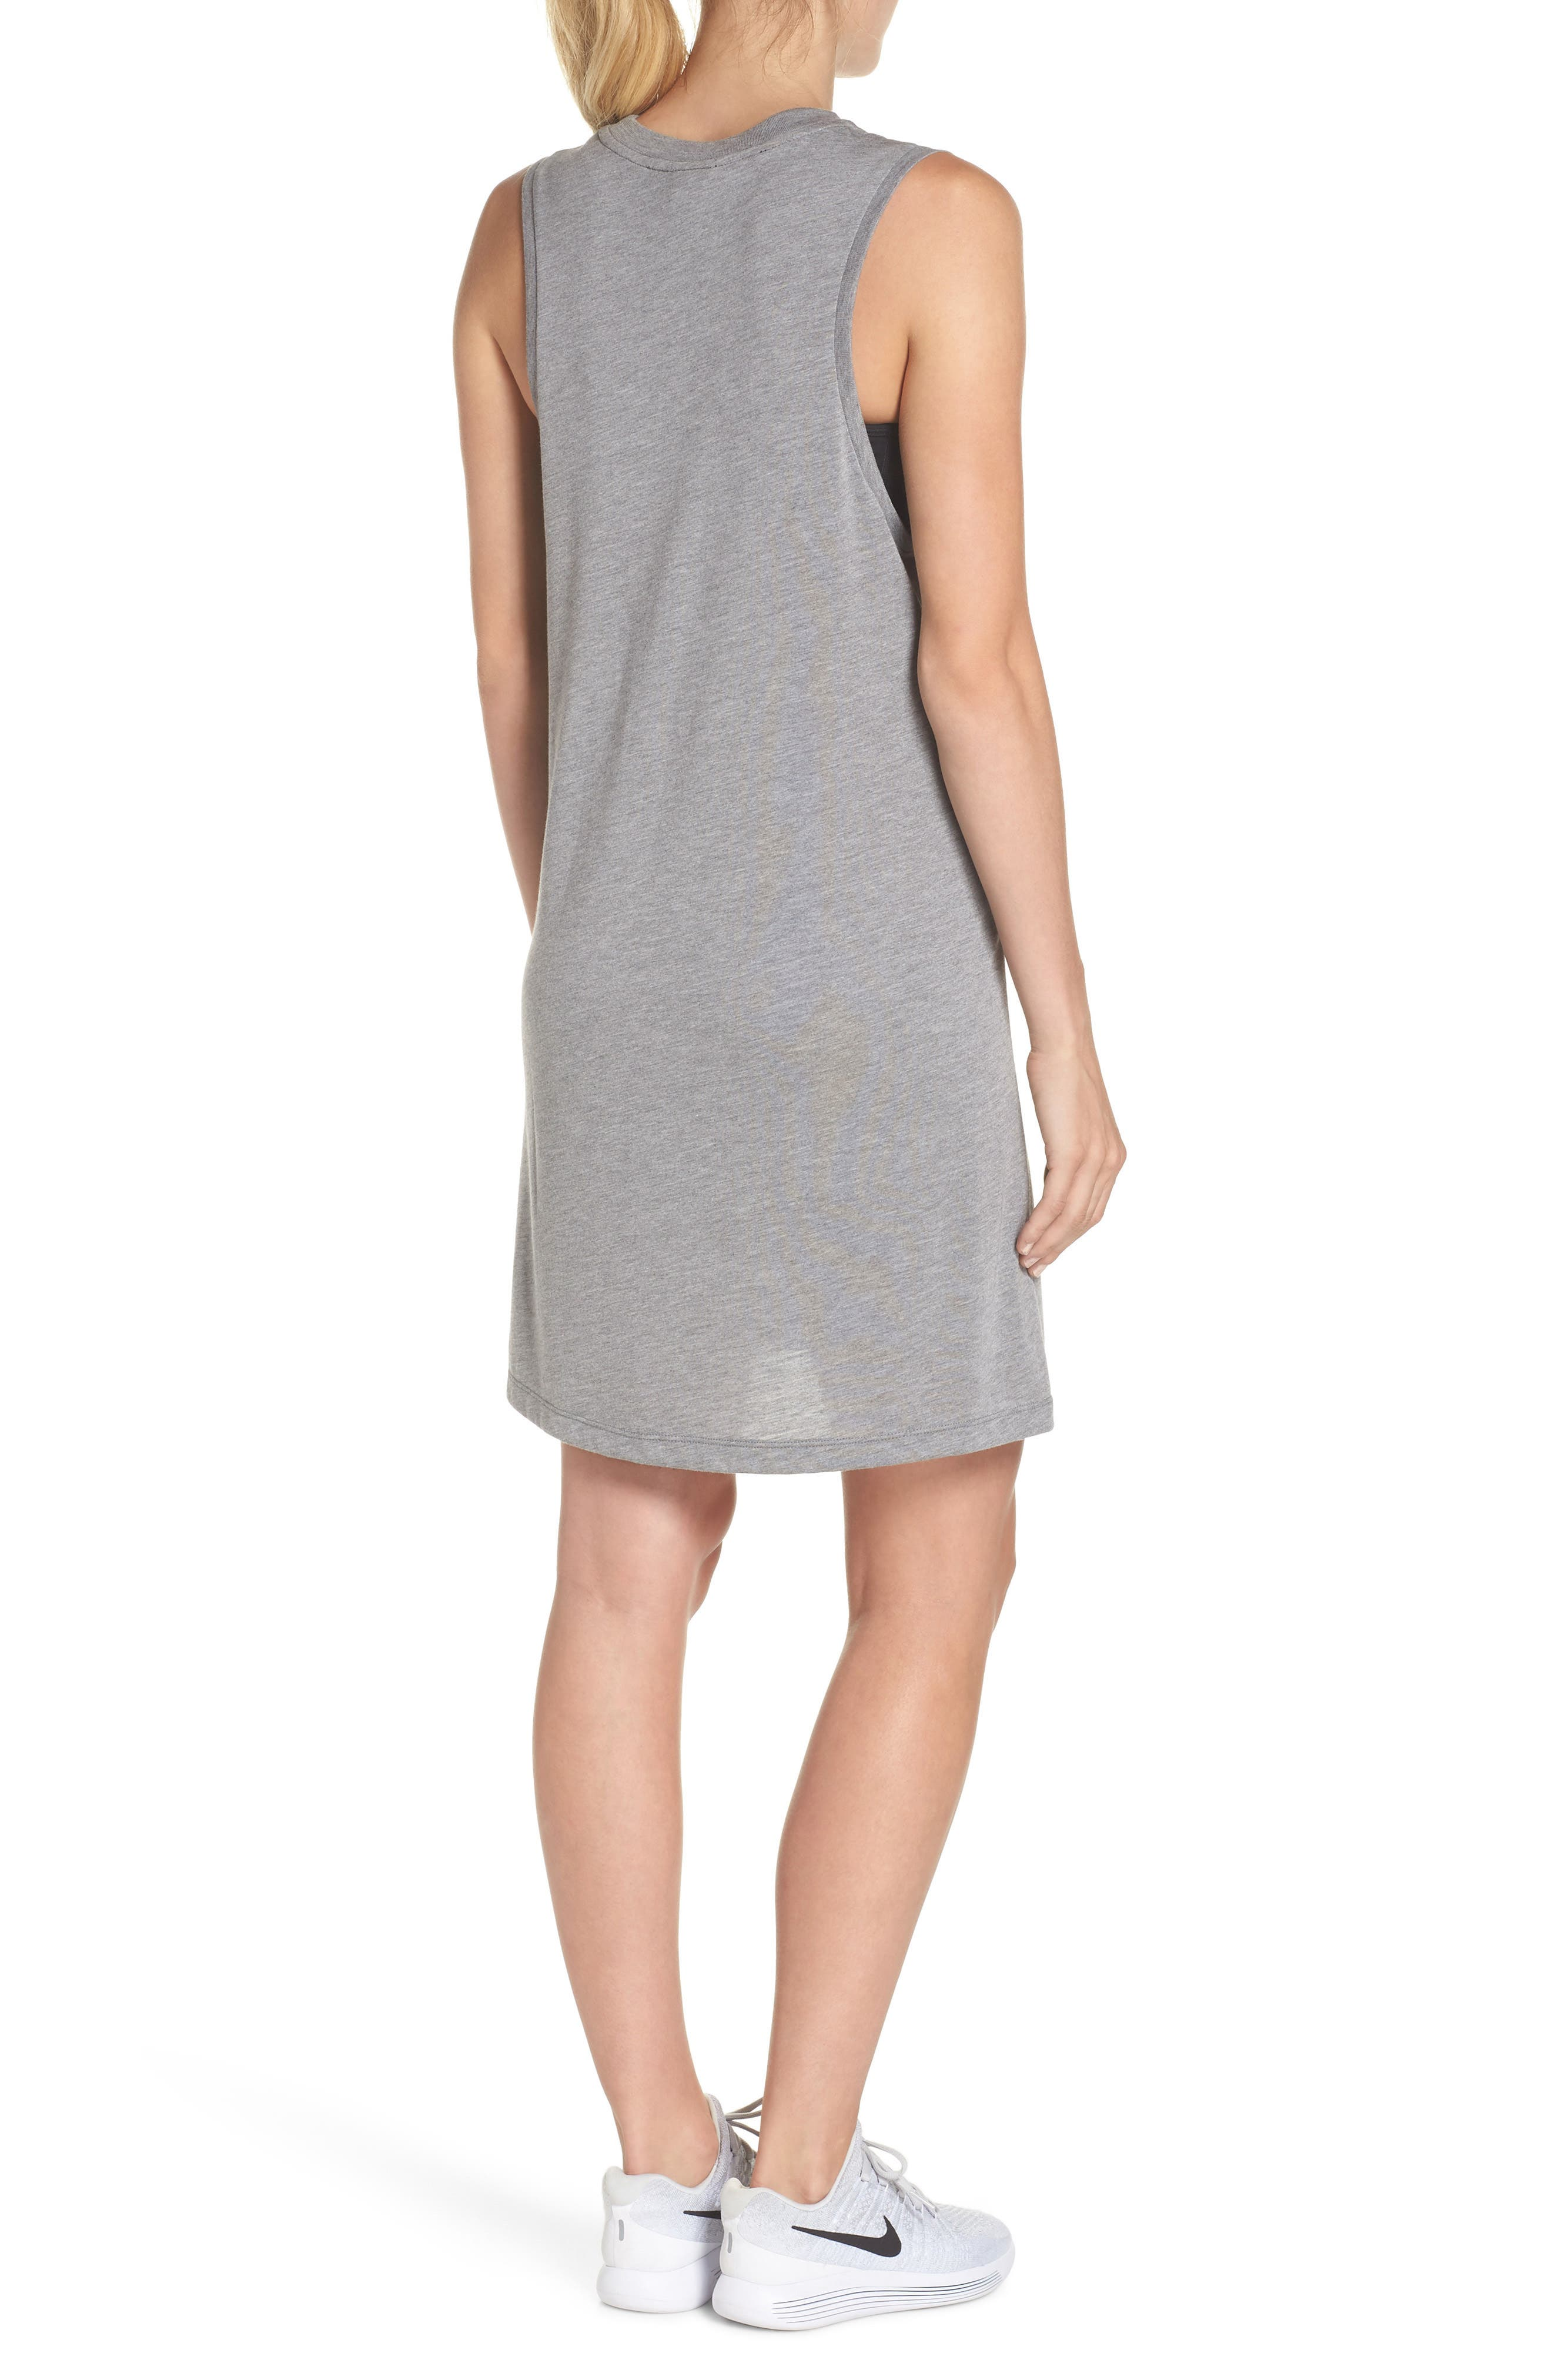 Sportswear Sleeveless Dress,                             Alternate thumbnail 2, color,                             Carbon Heather/ Crimson Pulse